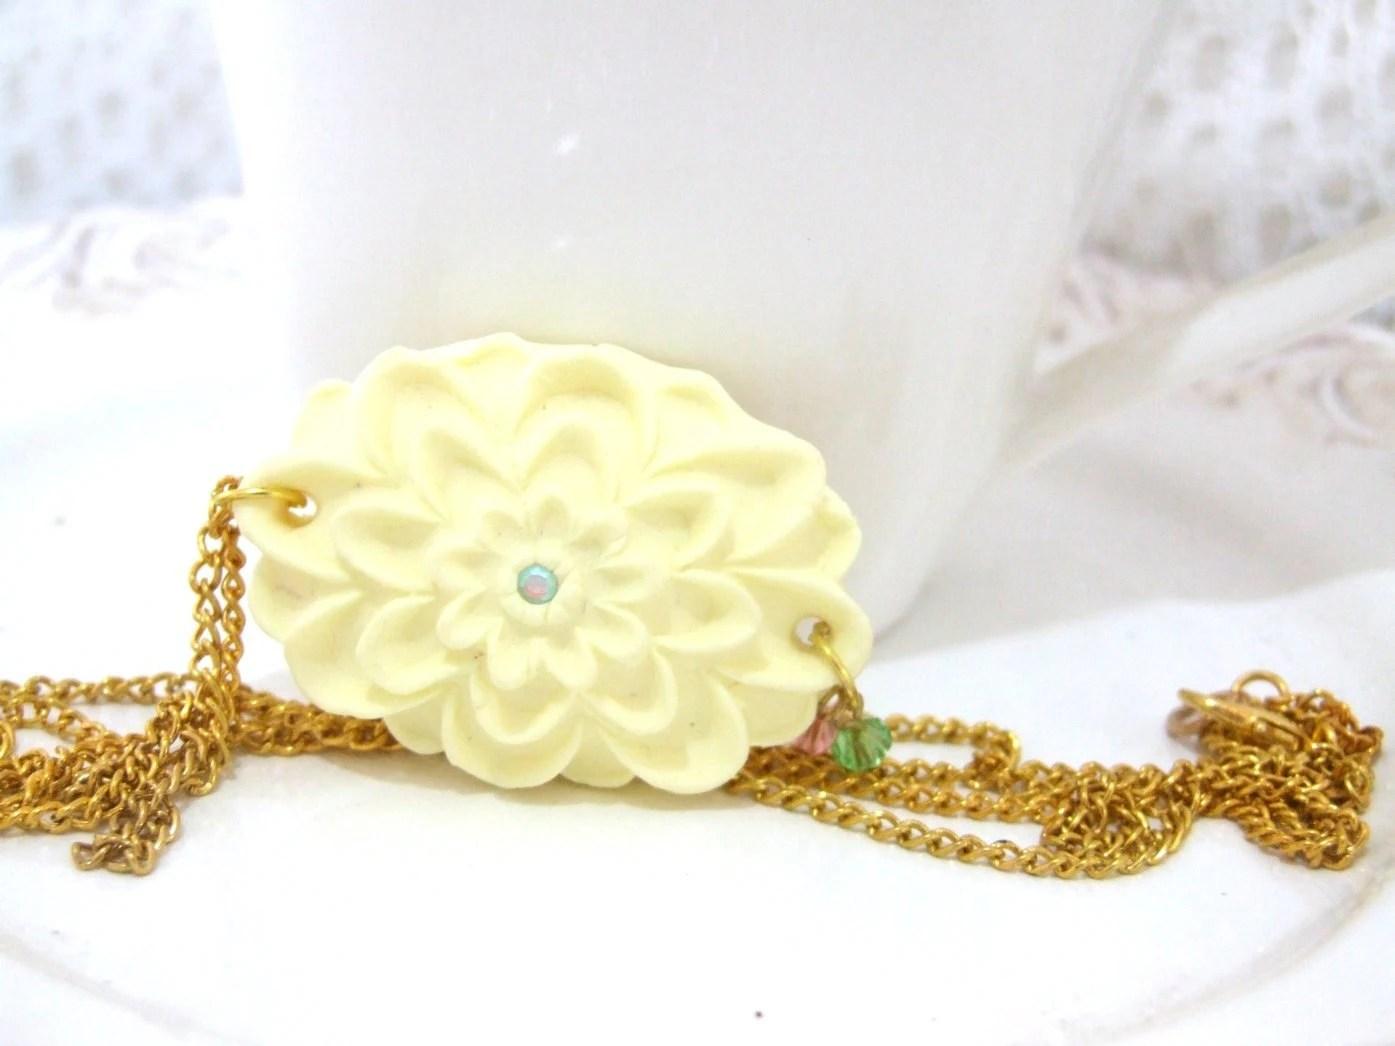 Necklace - vintage polymer clay golden cabochon necklace in cream - moriadesigns